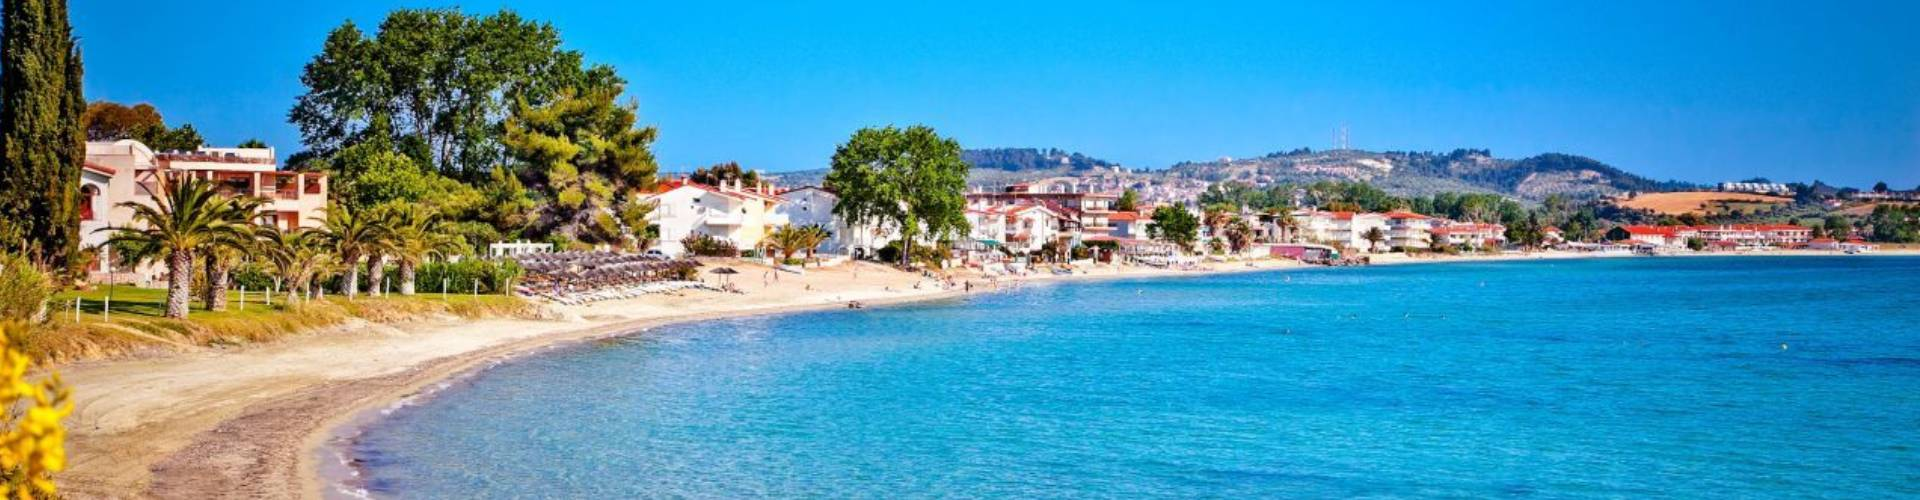 Fourka plaža